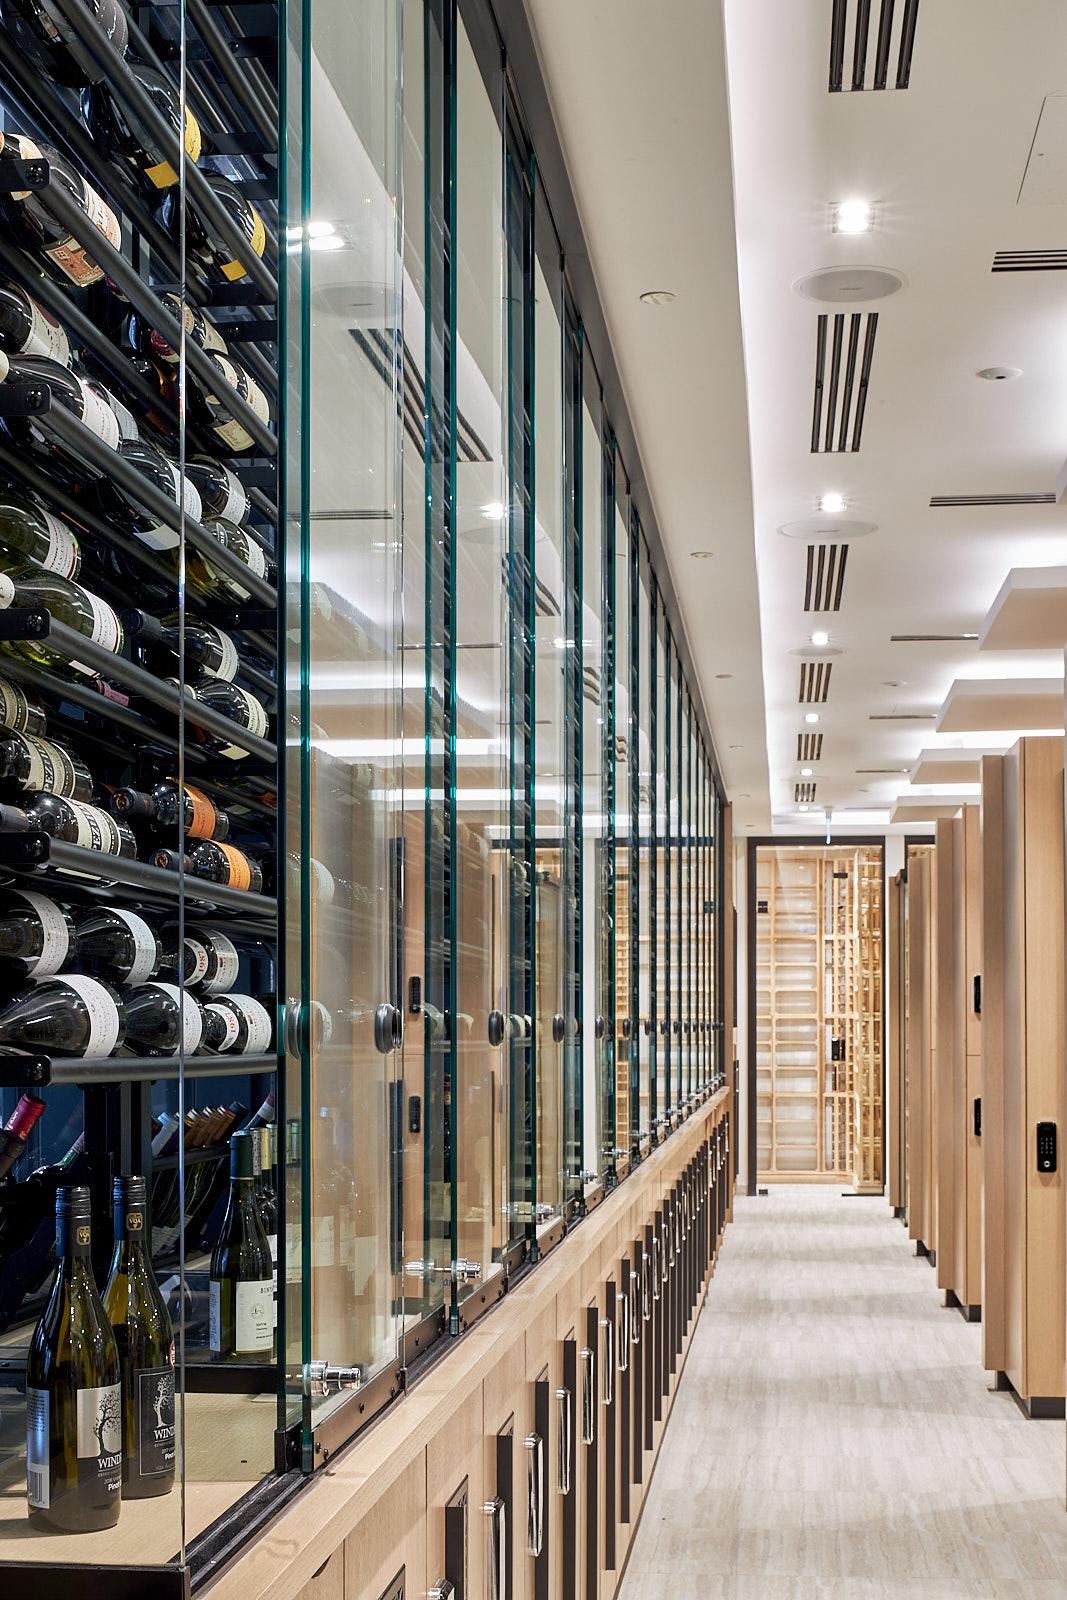 GTA's premium wine cellar @dymonwinecellar is now open at 1460 The Queensway, Toronto!